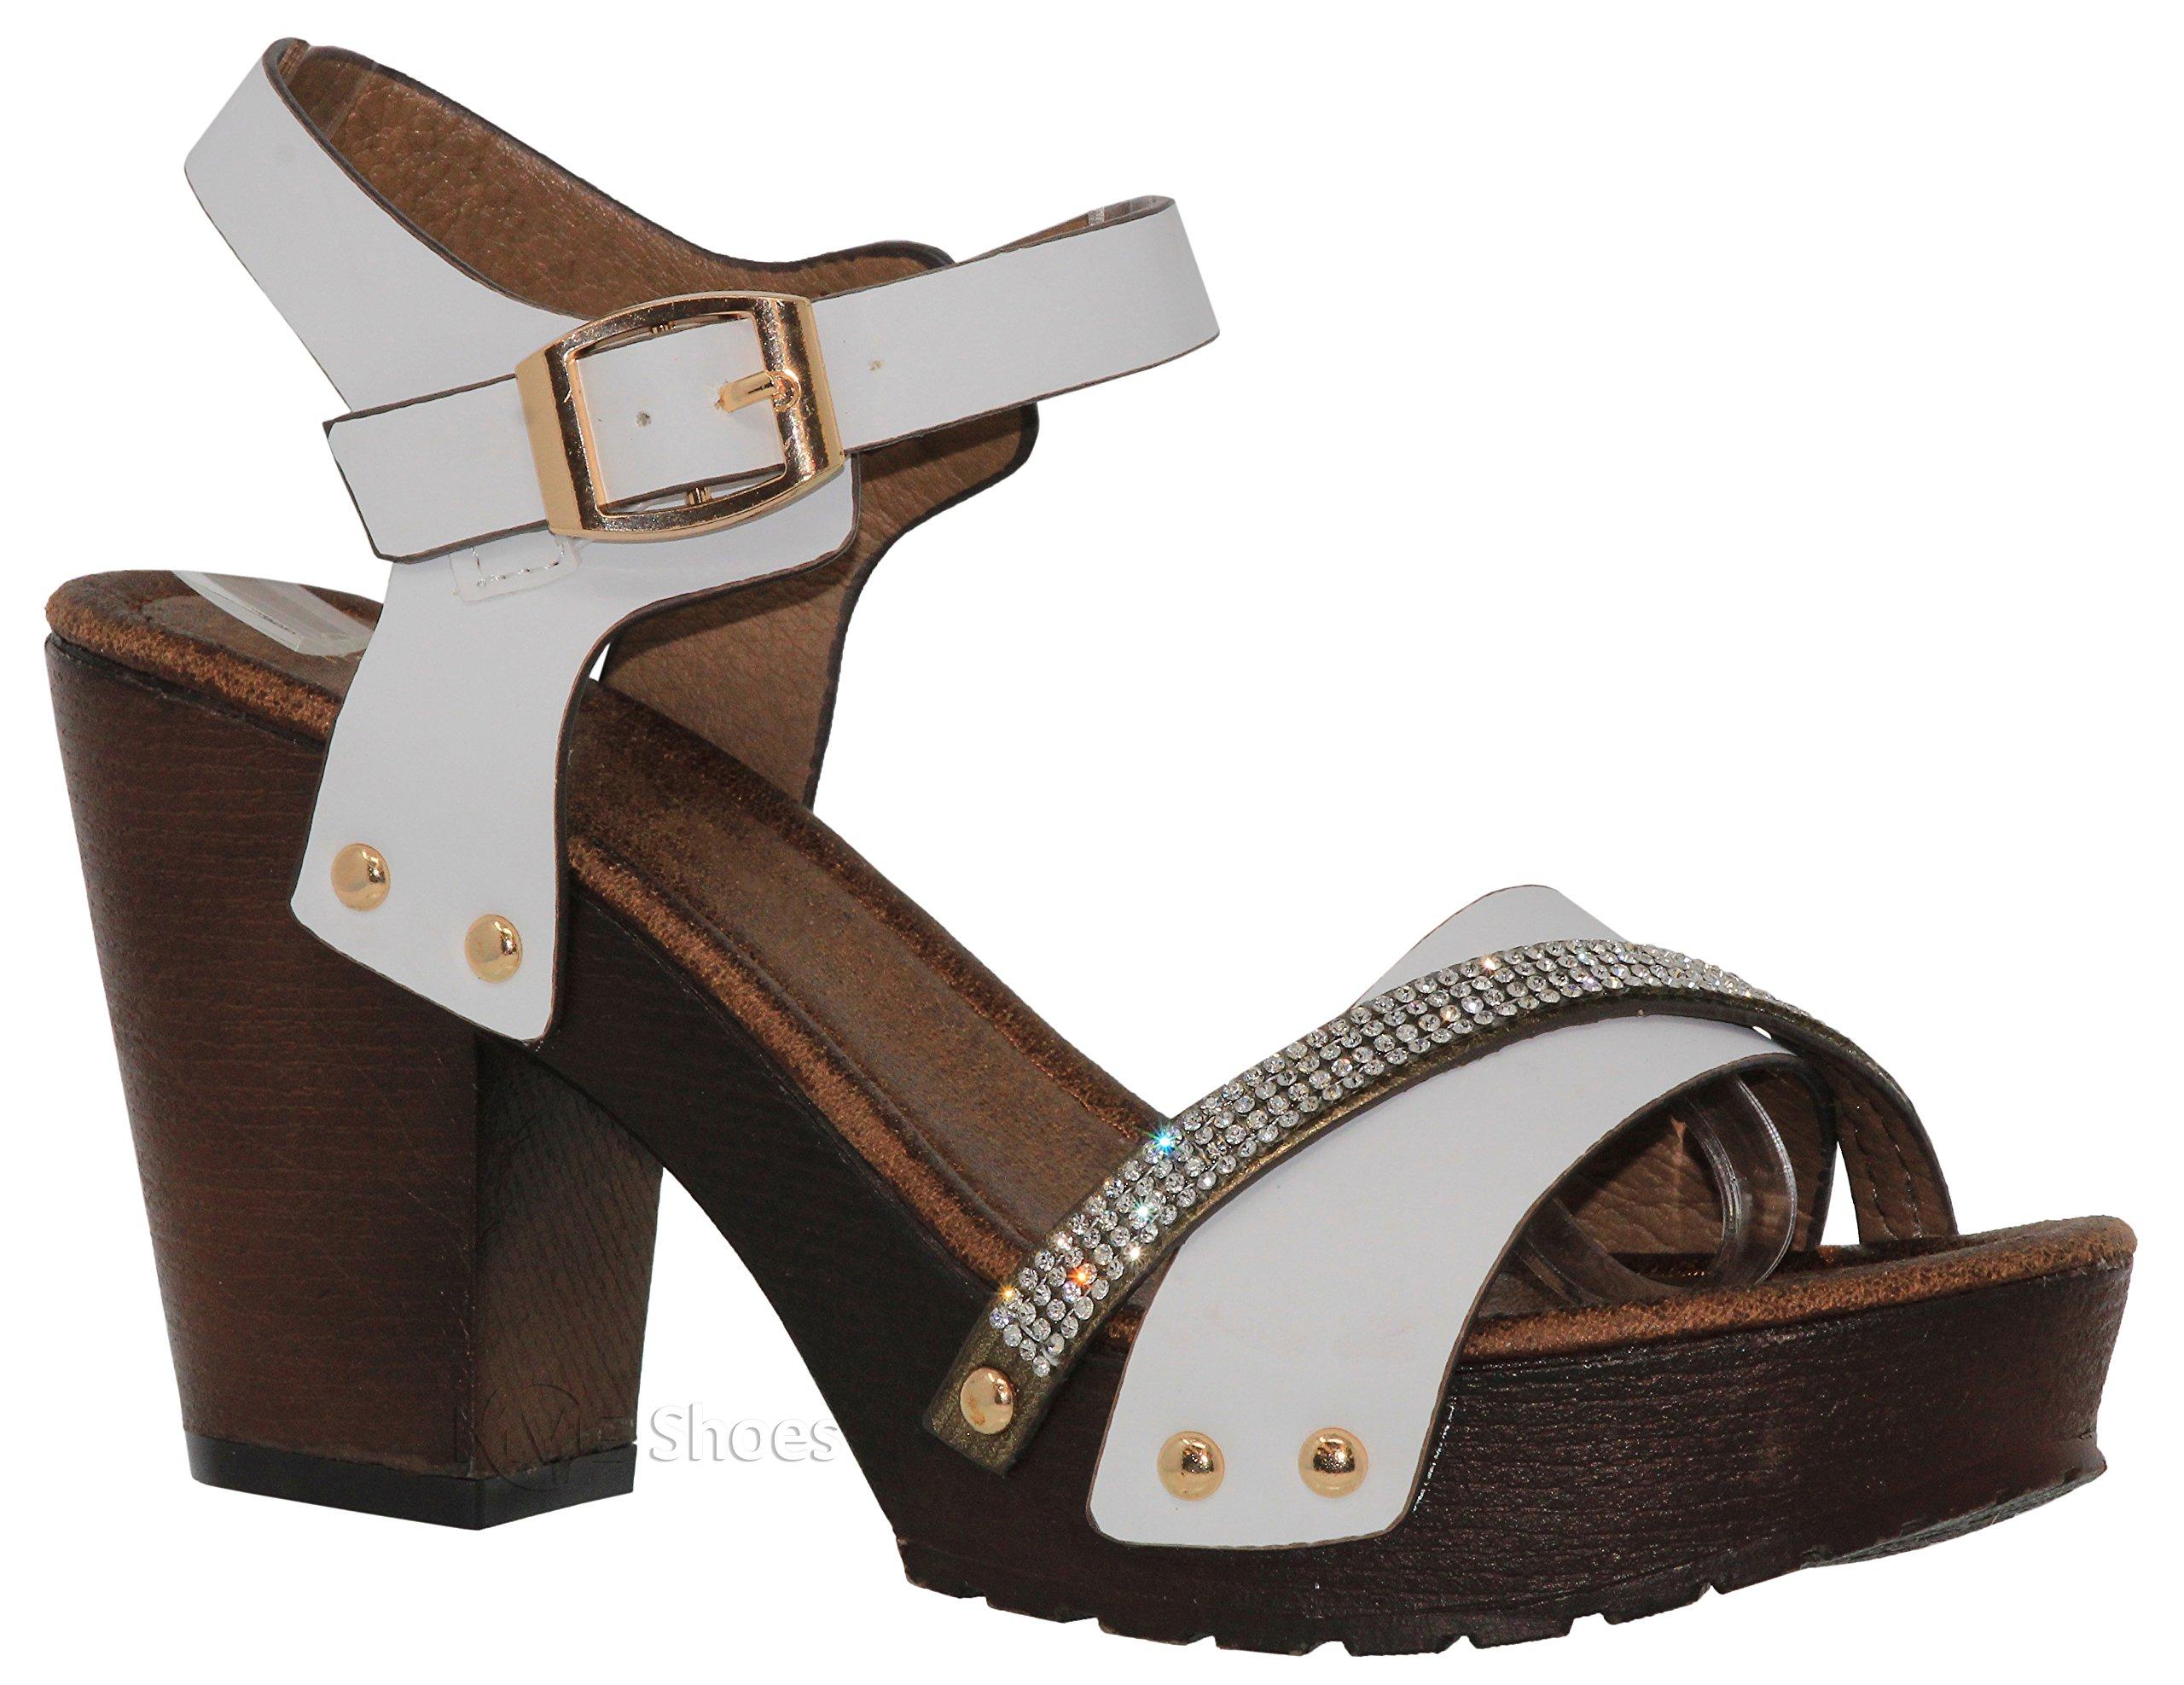 MVE Shoes Women's Ankle Strap Faux Wood Platform Chunky Heel Sandal,vint-02 White pu 10 by MVE Shoes (Image #1)